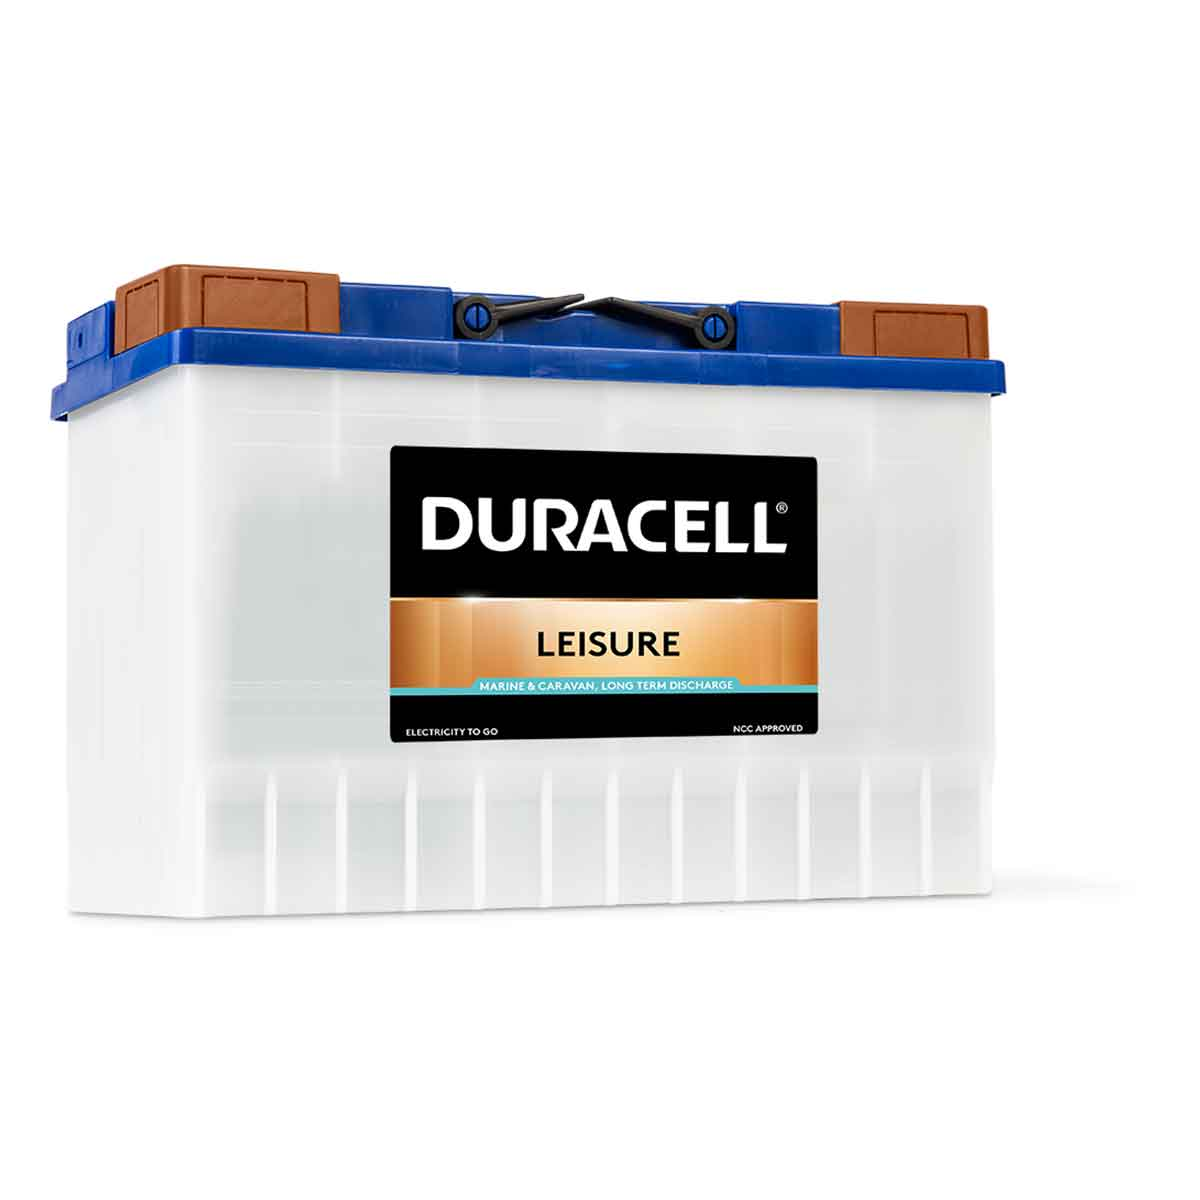 Duracell leisure battery jpg